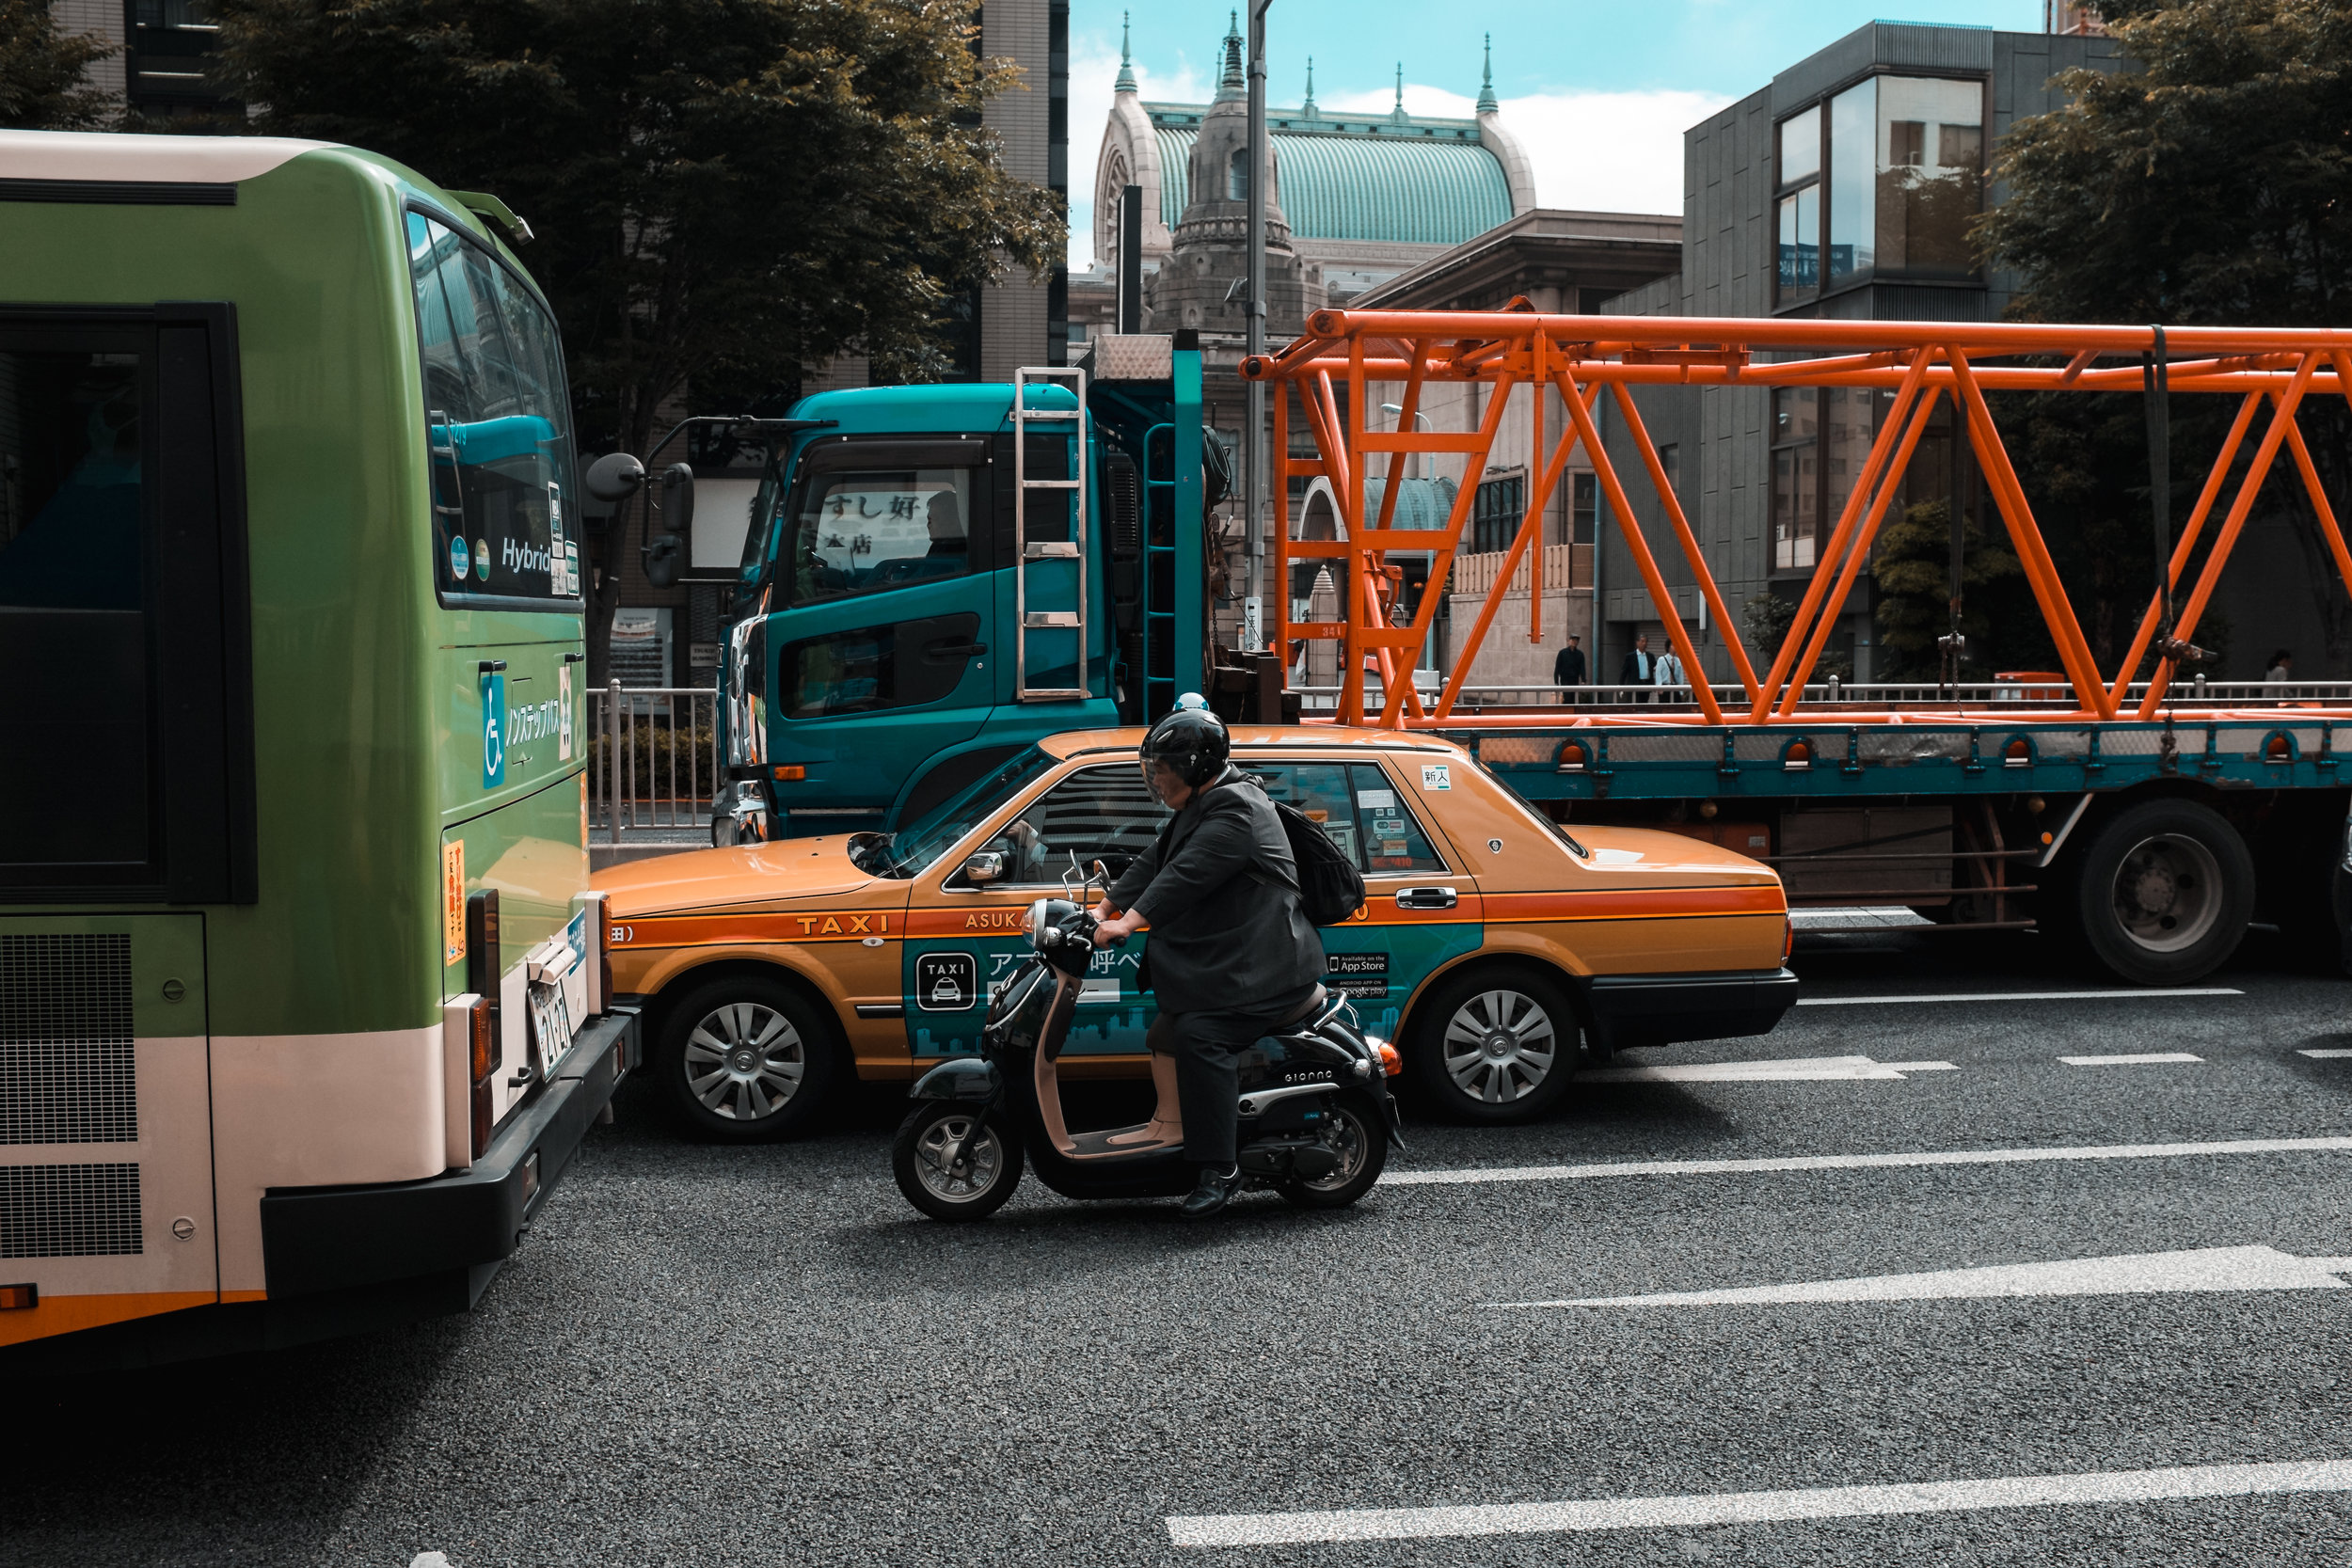 TokyoJapan_2018_AdamDillon_DSCF9074.jpg